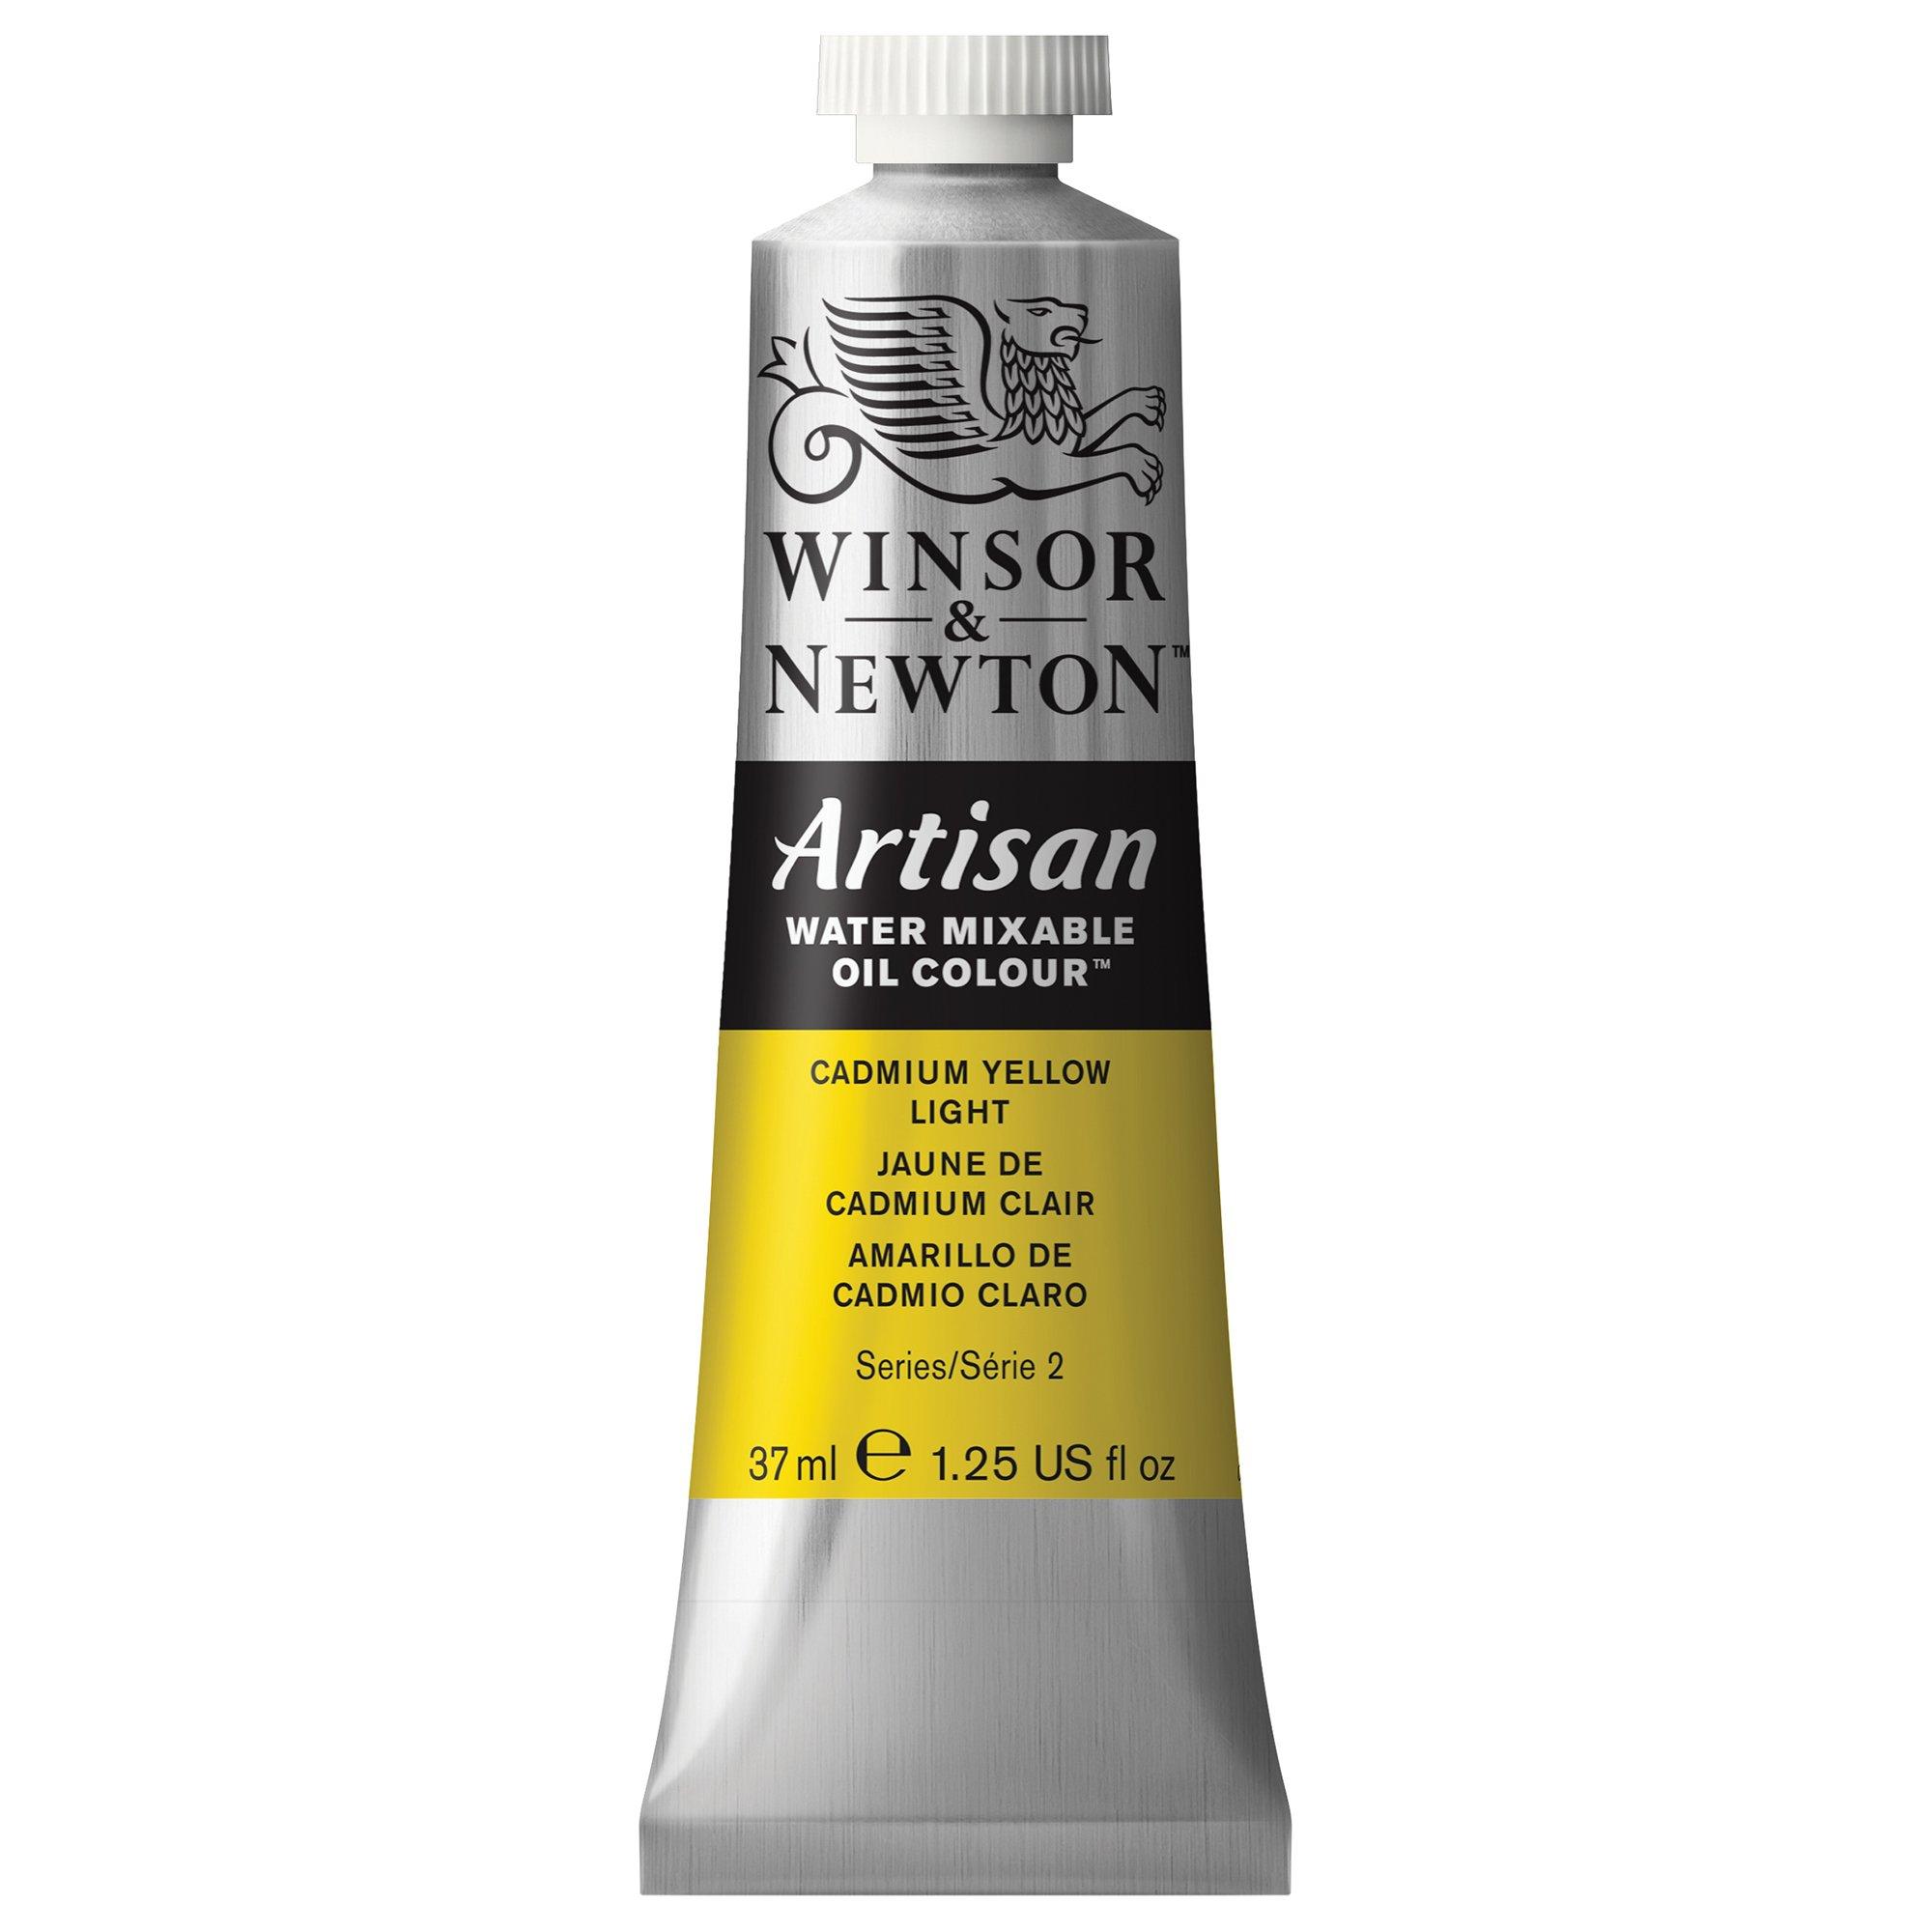 Winsor & Newton Artisan Water Mixable Oil Colour, 37ml Tube, Cadmium Yellow Light